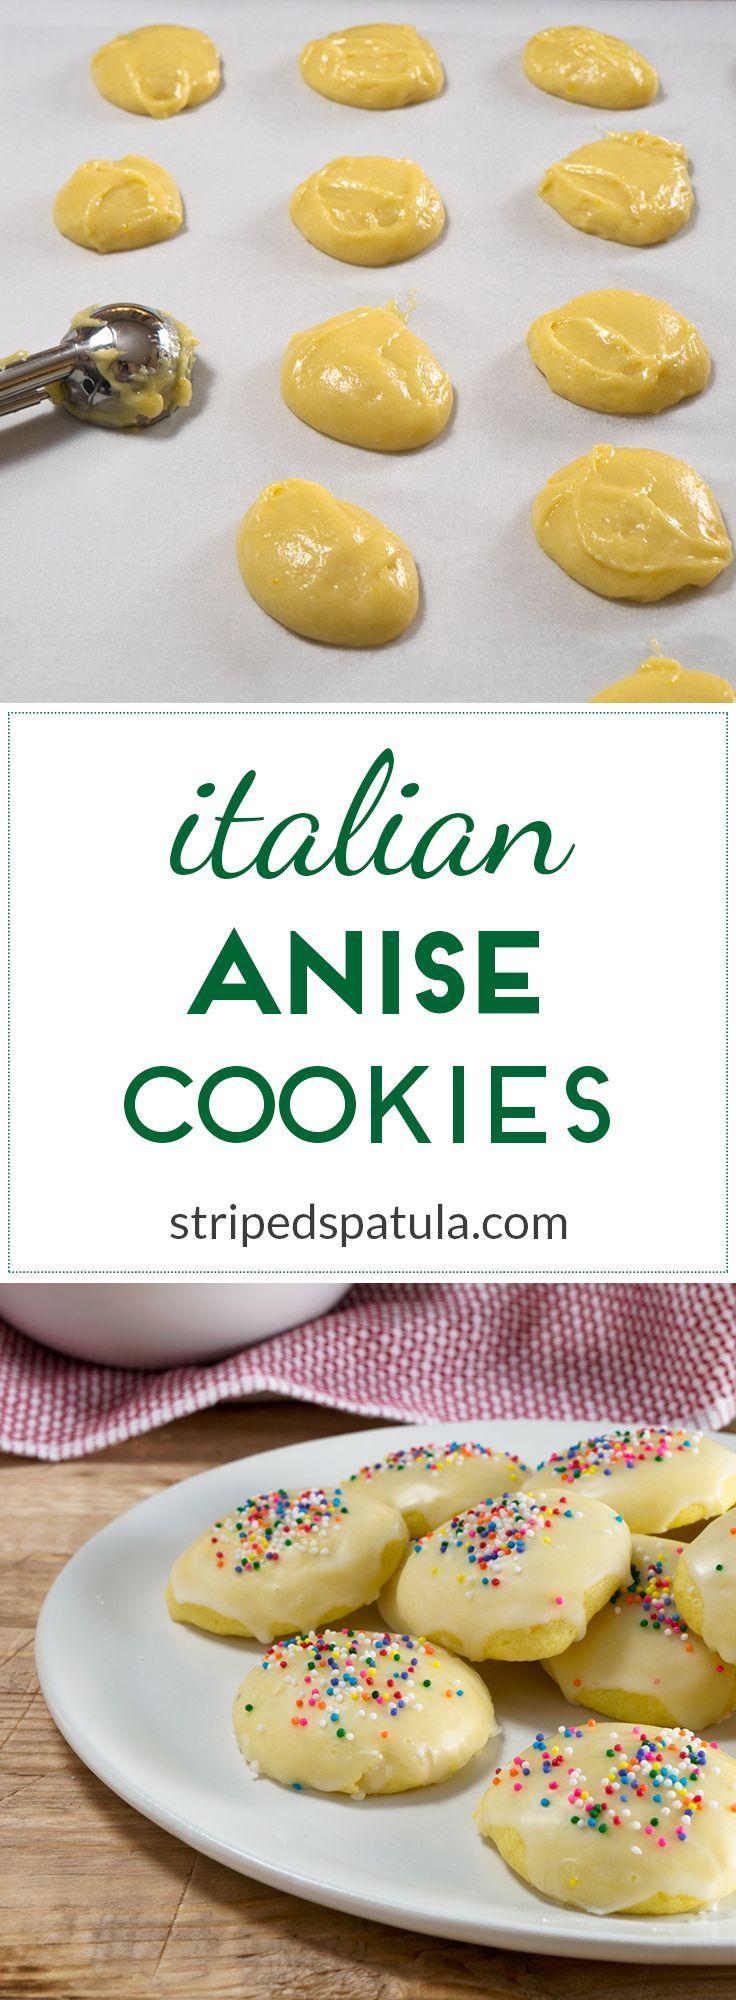 Josephine\'s Anise Cookies | Recipe | Best of Blogger Food ...